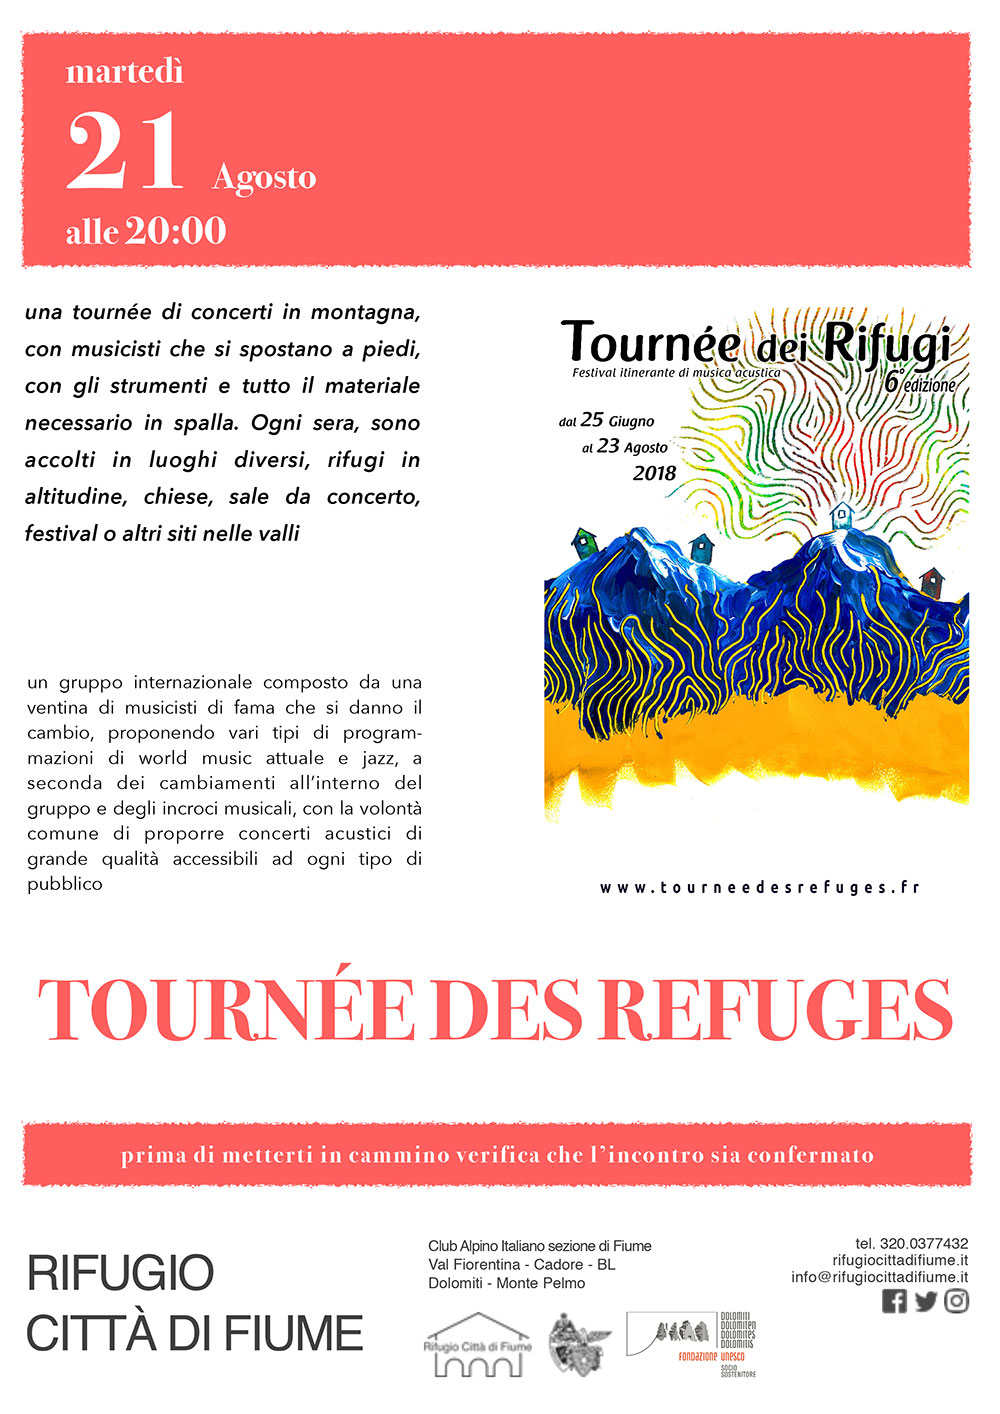 rifugio-città-di-fiume-tourneedesrefuges